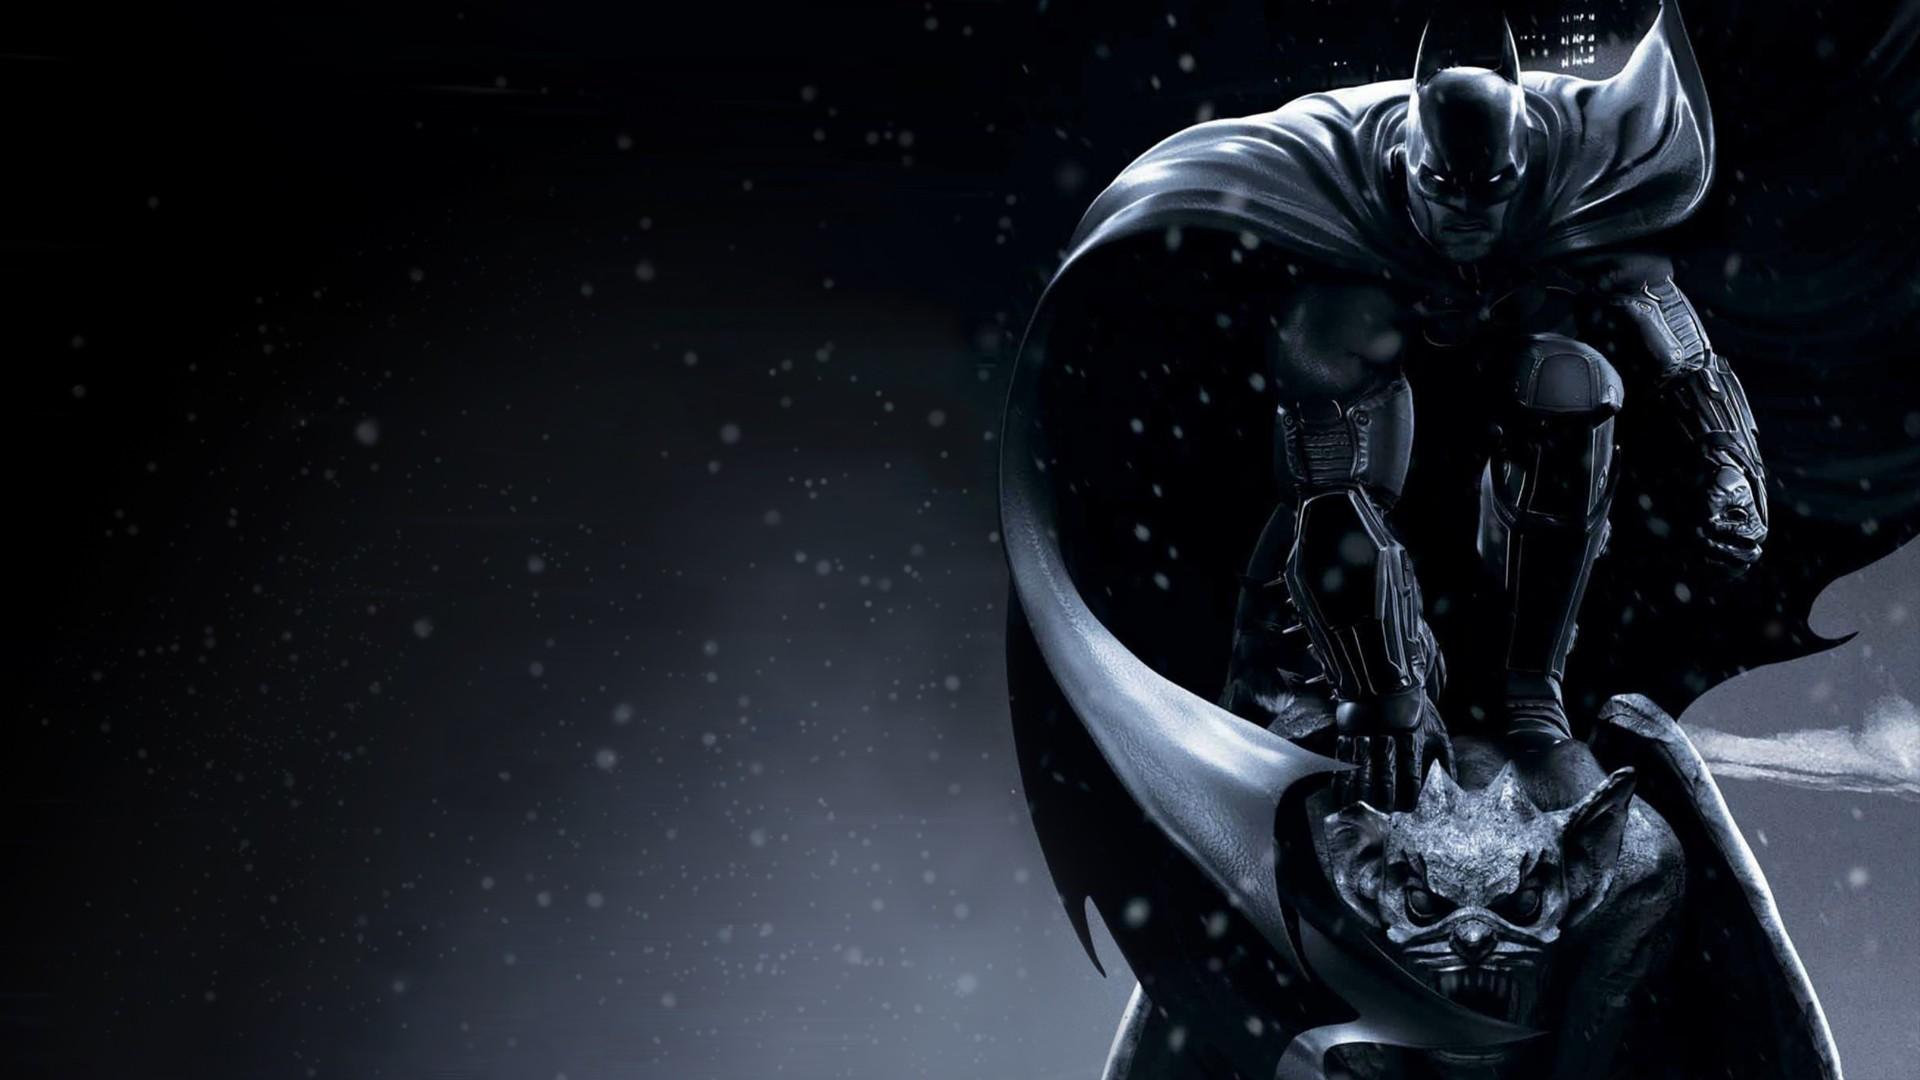 Batman Arkham Origins 2013 Wallpapers | HD Wallpapers